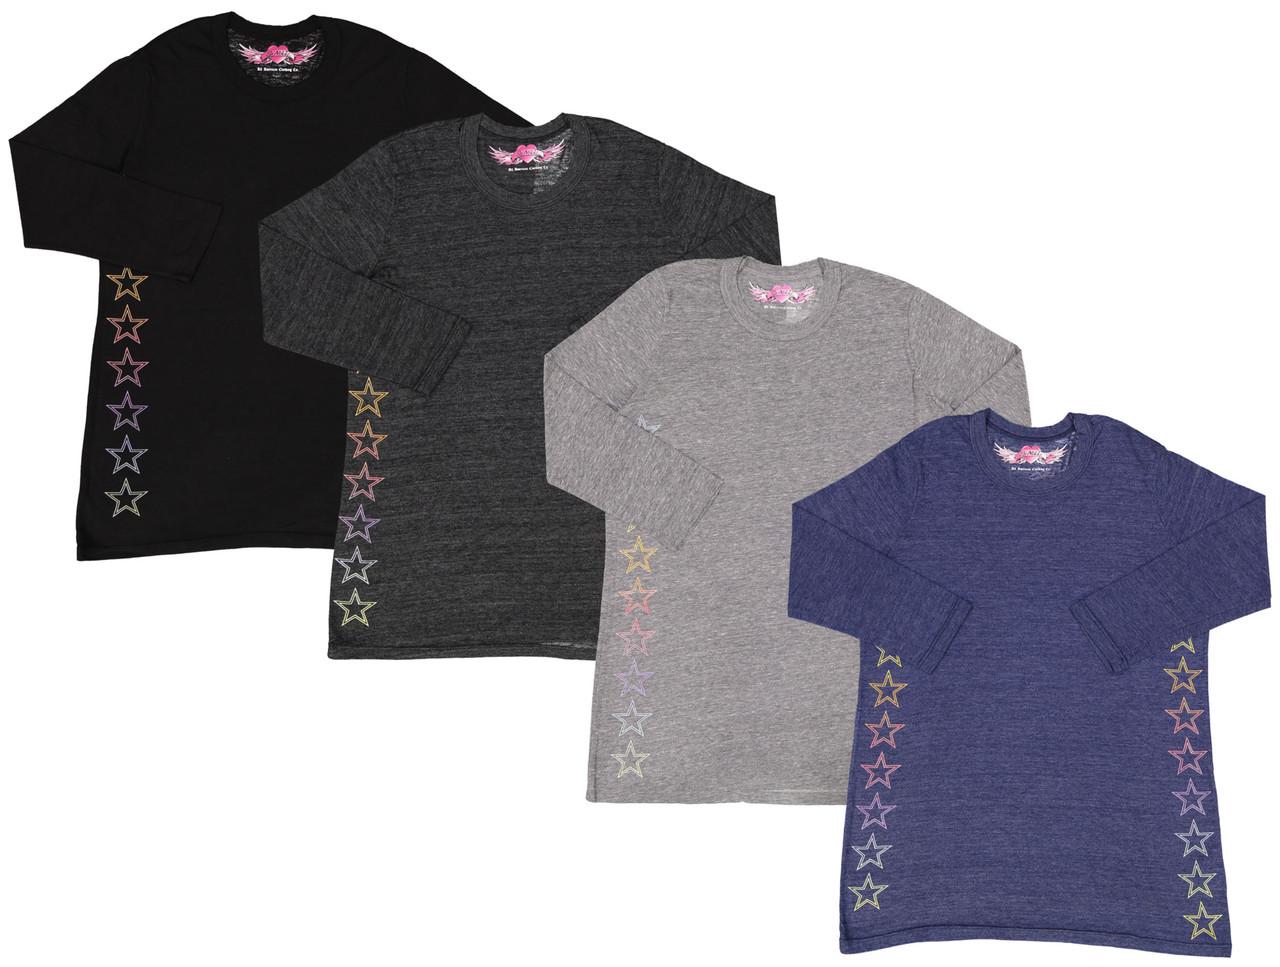 So Nikki Girls 3/4 Sleeve T-shirt - 1255K-P554B